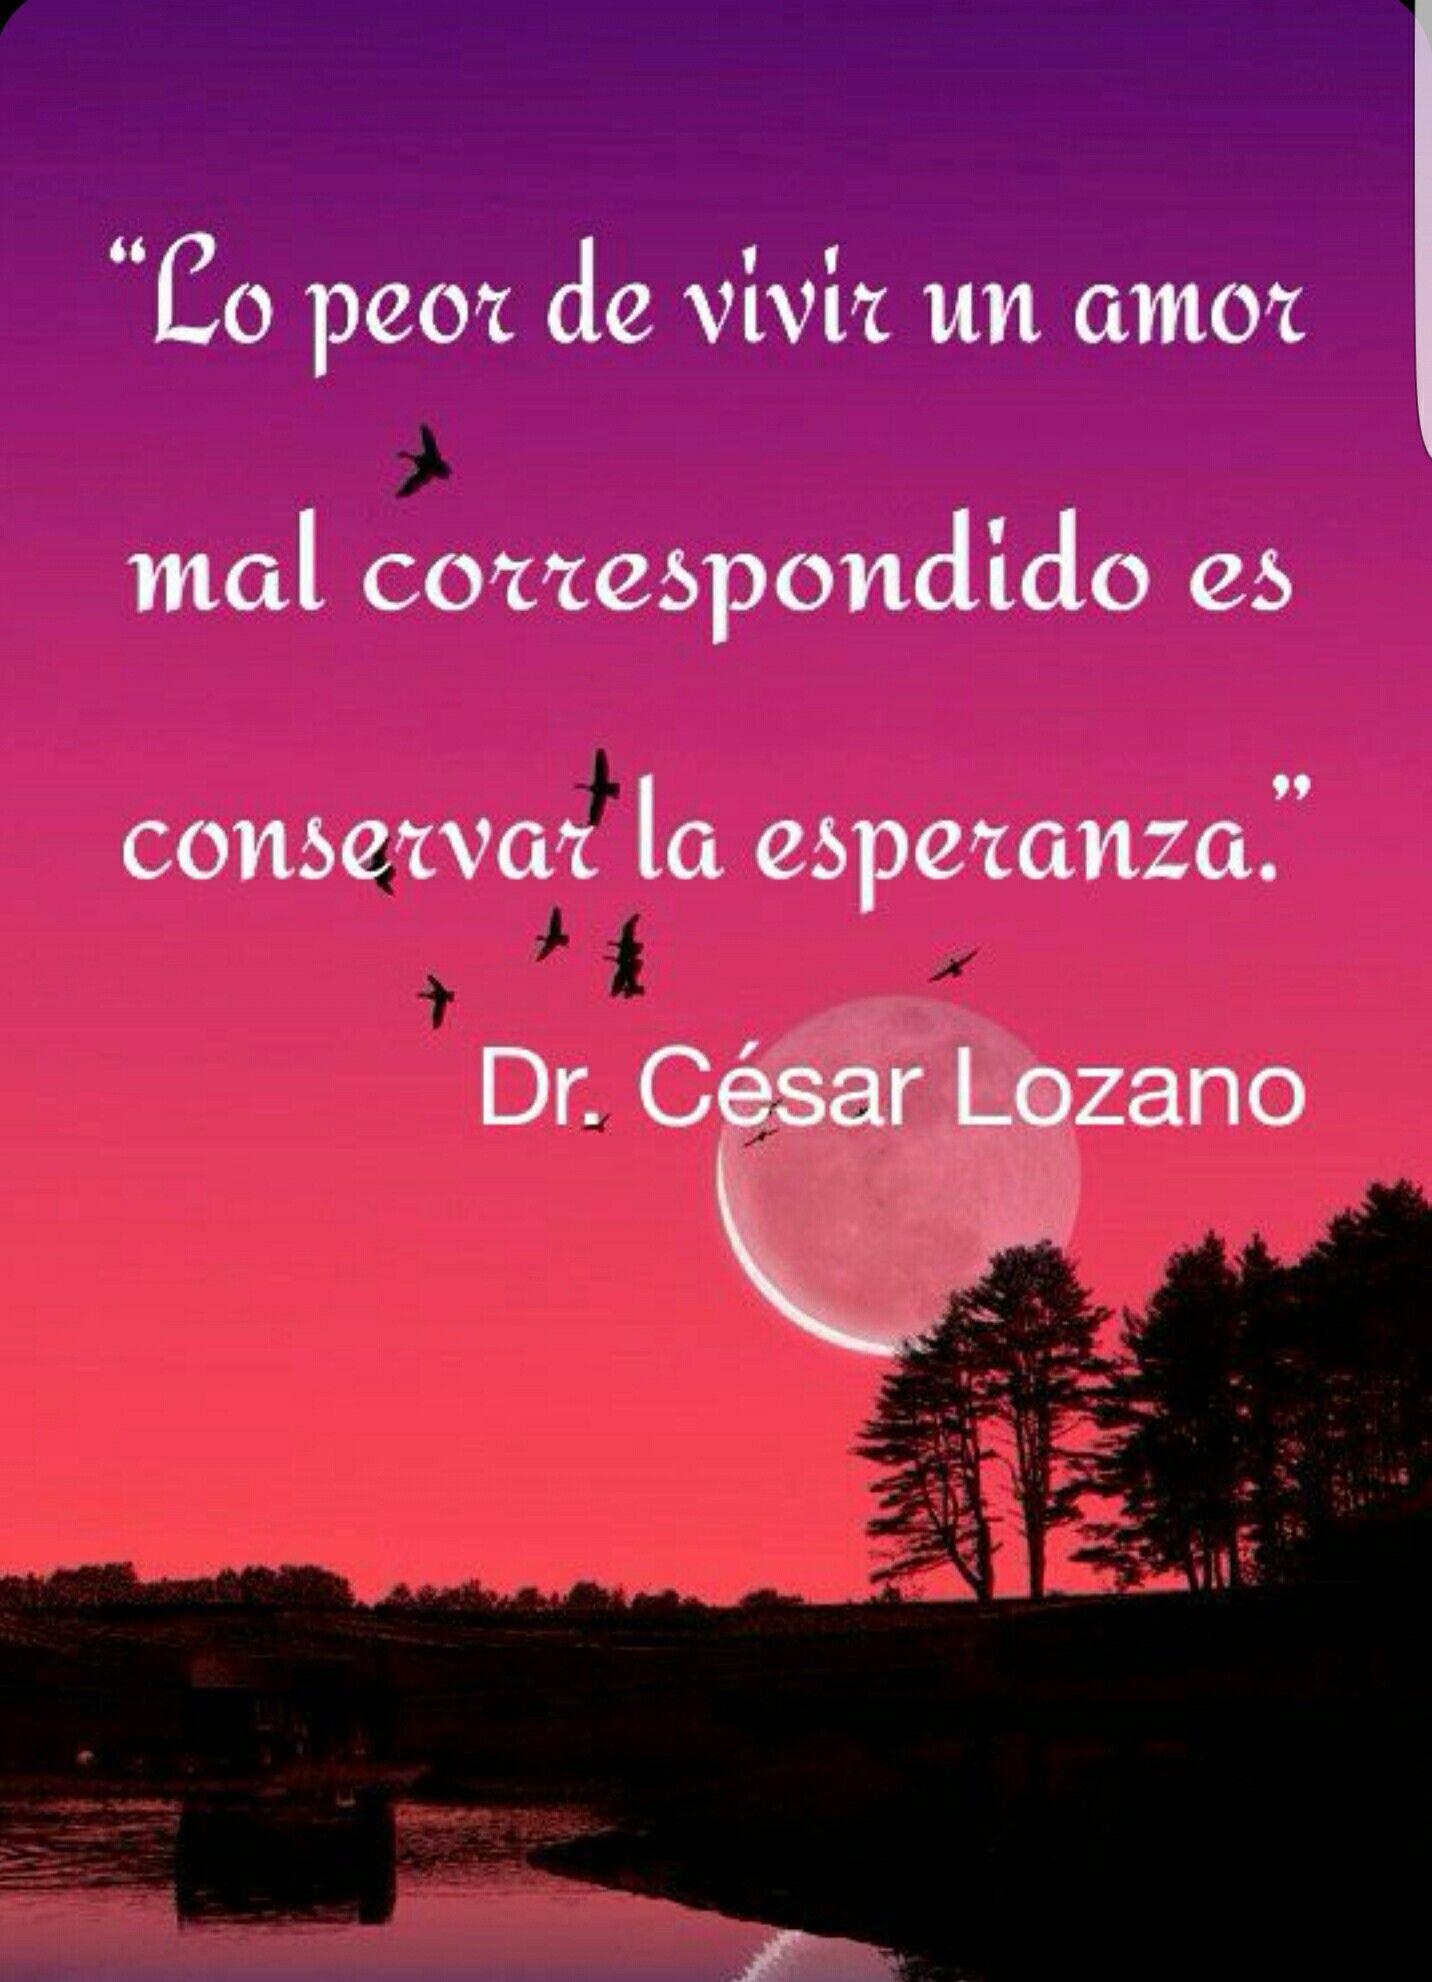 Frases De Despedida De Amor No Correspondido